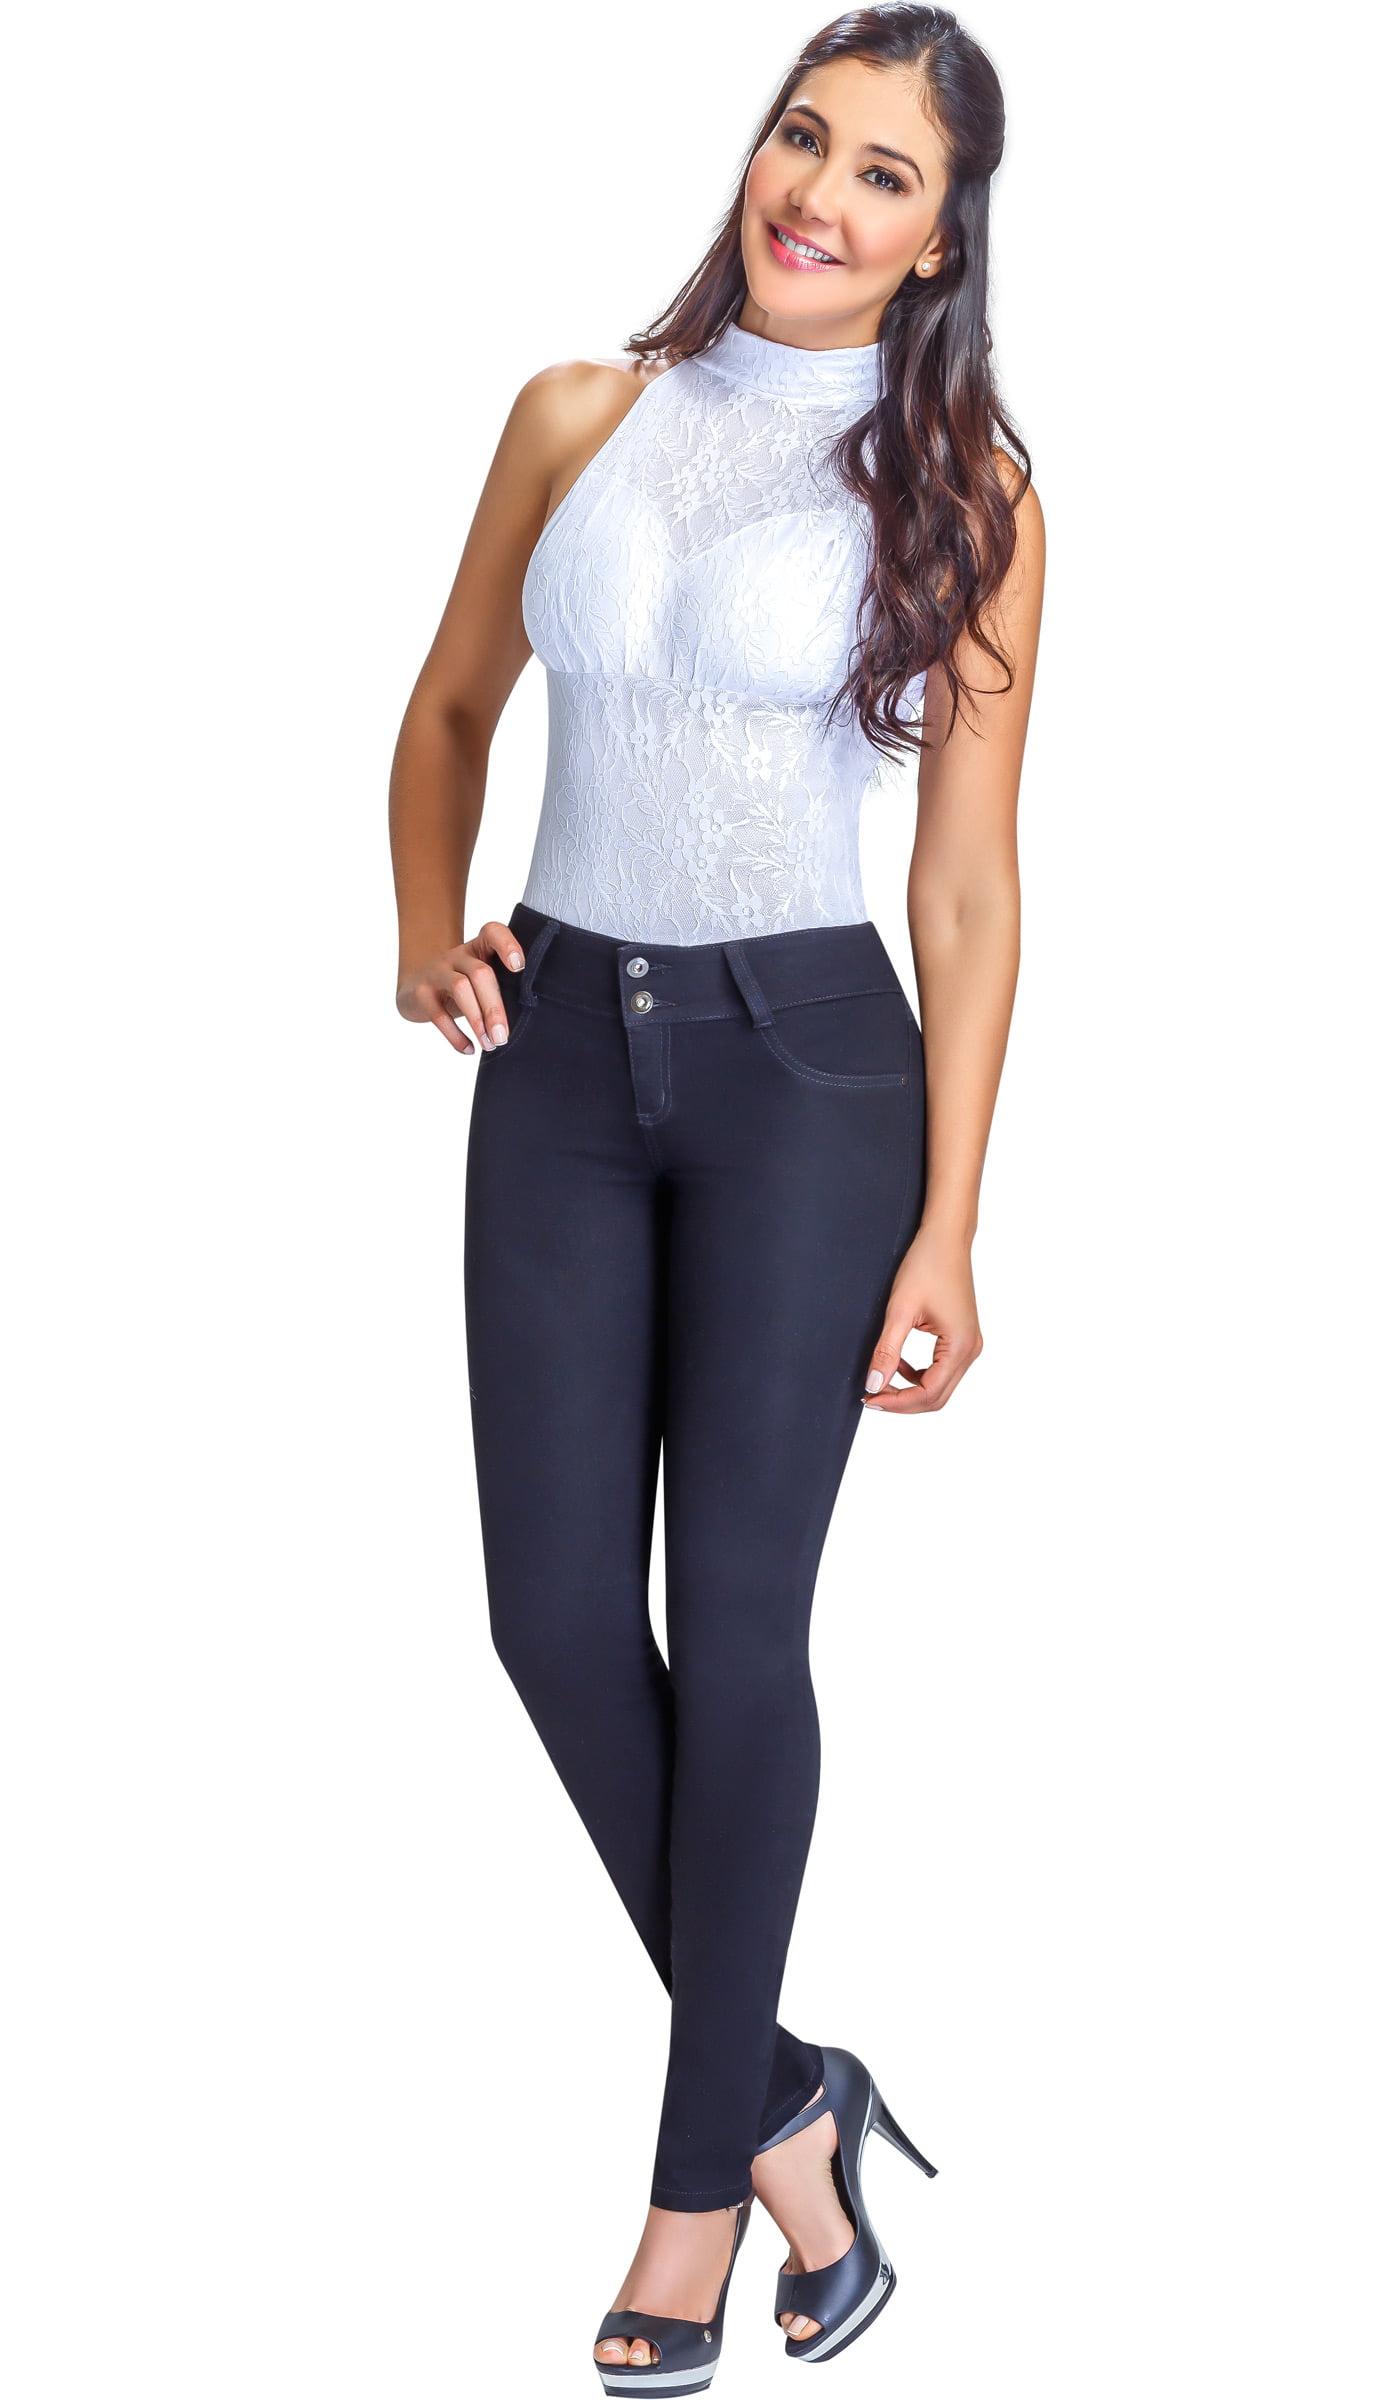 Jeans Lowla Fashion